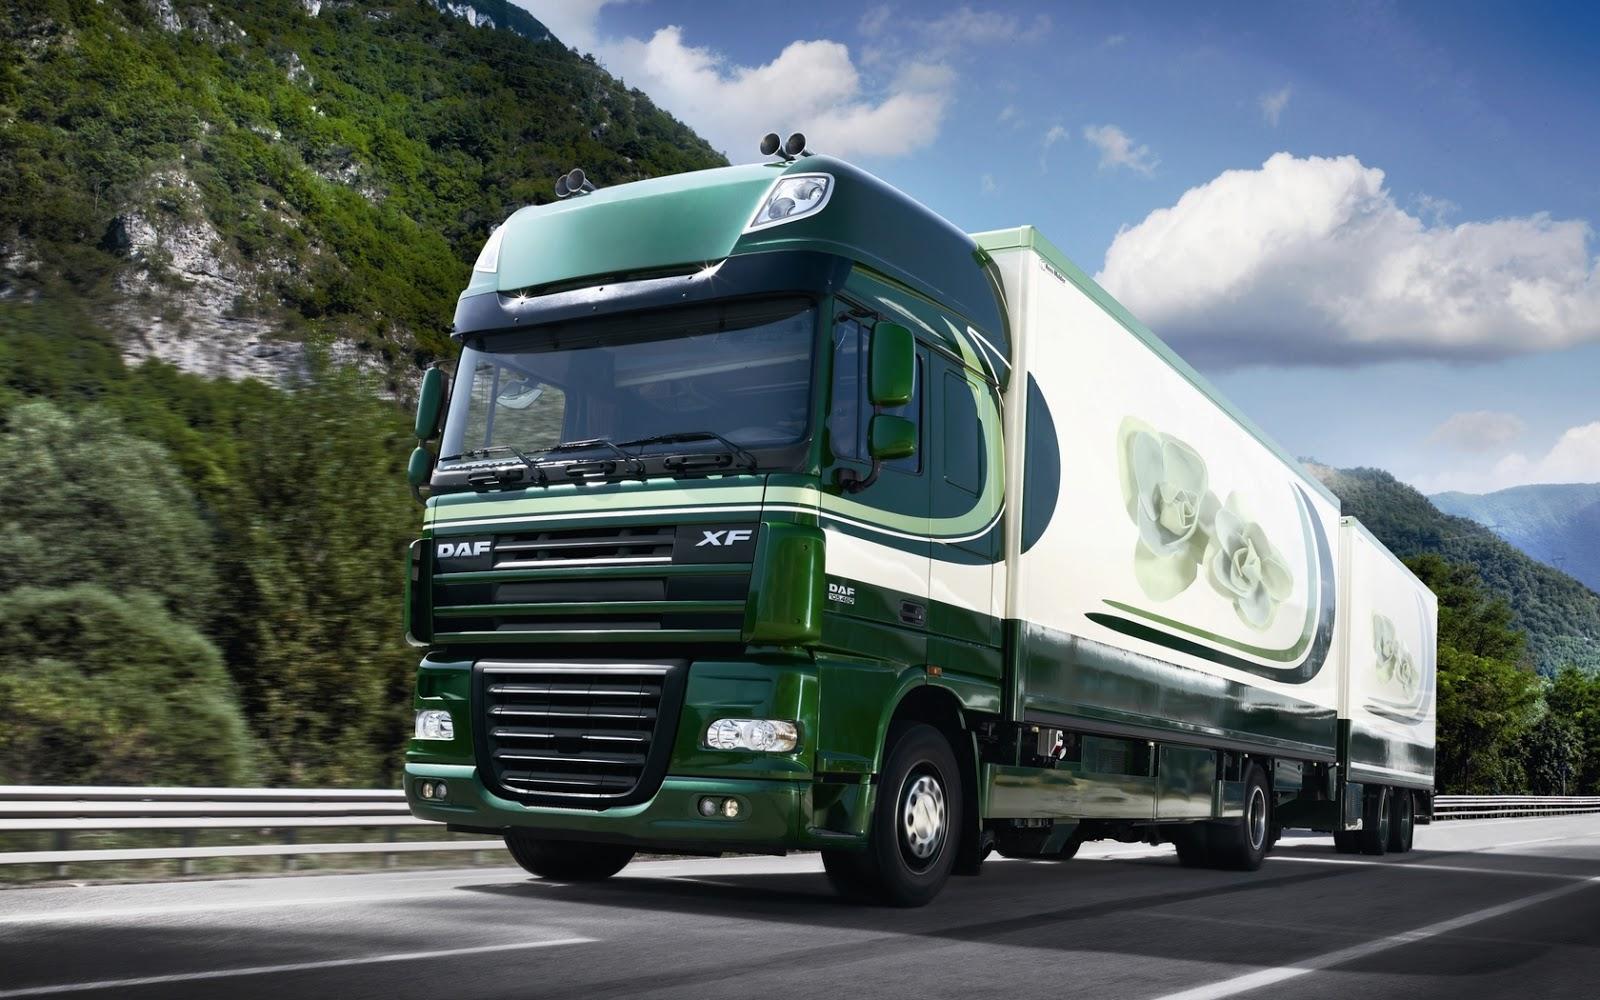 Wallpaper Name Daf Trucks Wallpapers Best Resolution 1280x720 HD 1600x1000